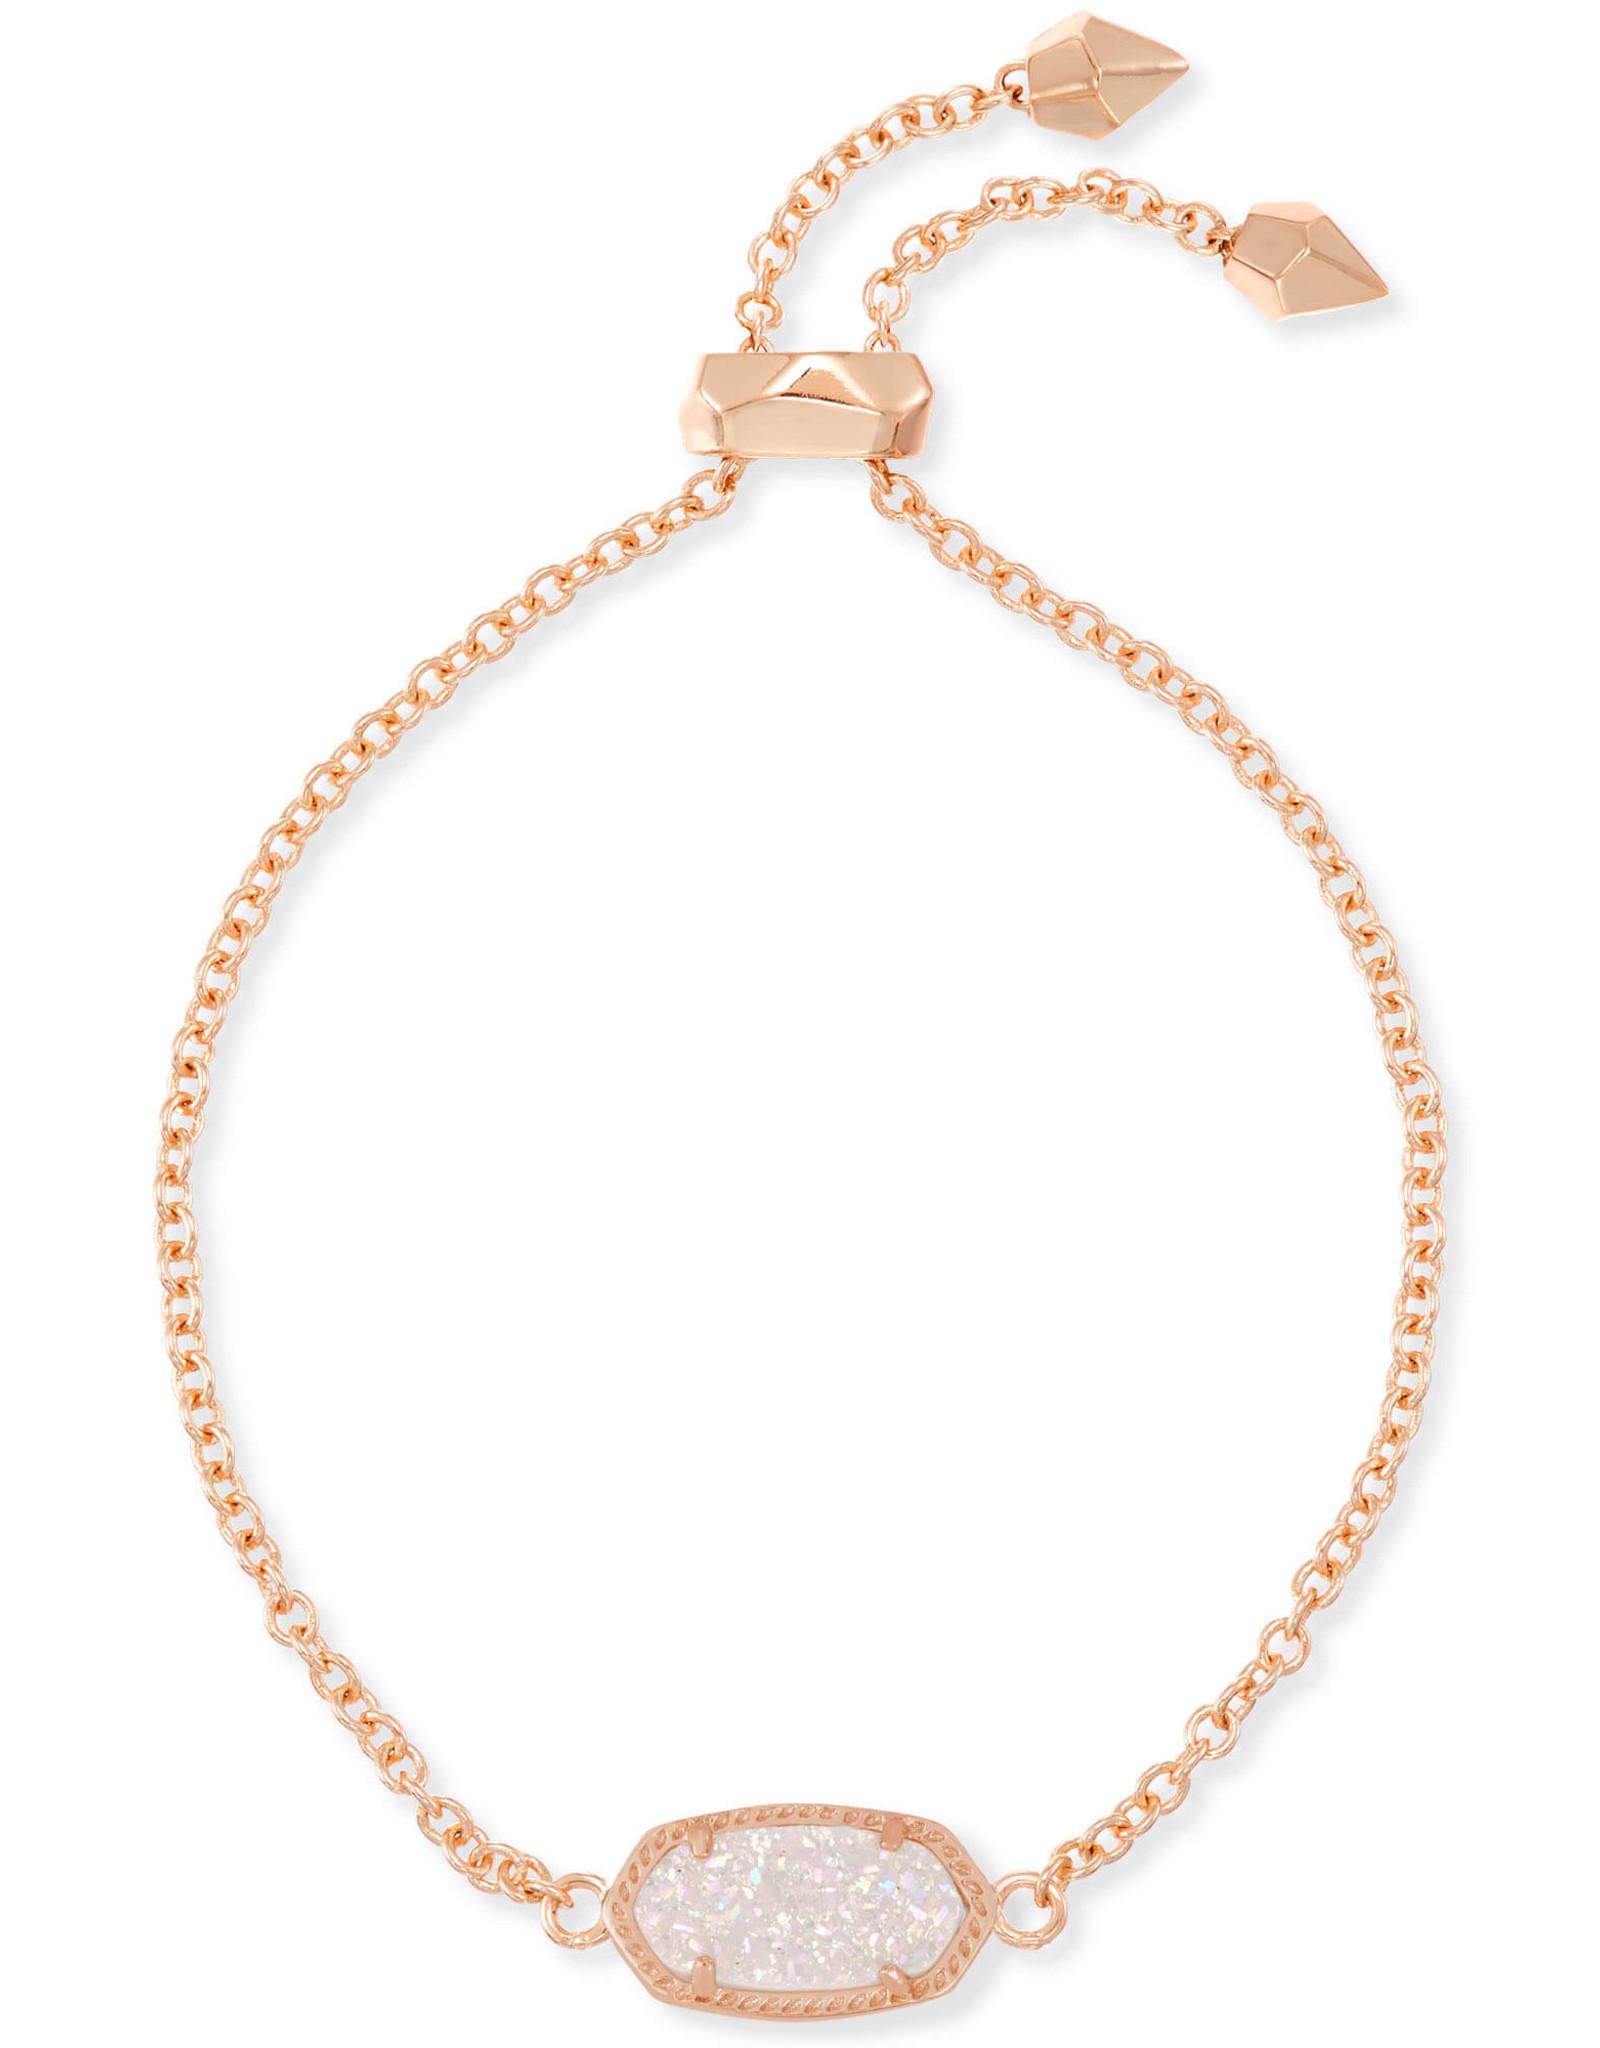 Kendra Scott Elaina Bracelet - Iridescent Drusy/Rose Gold